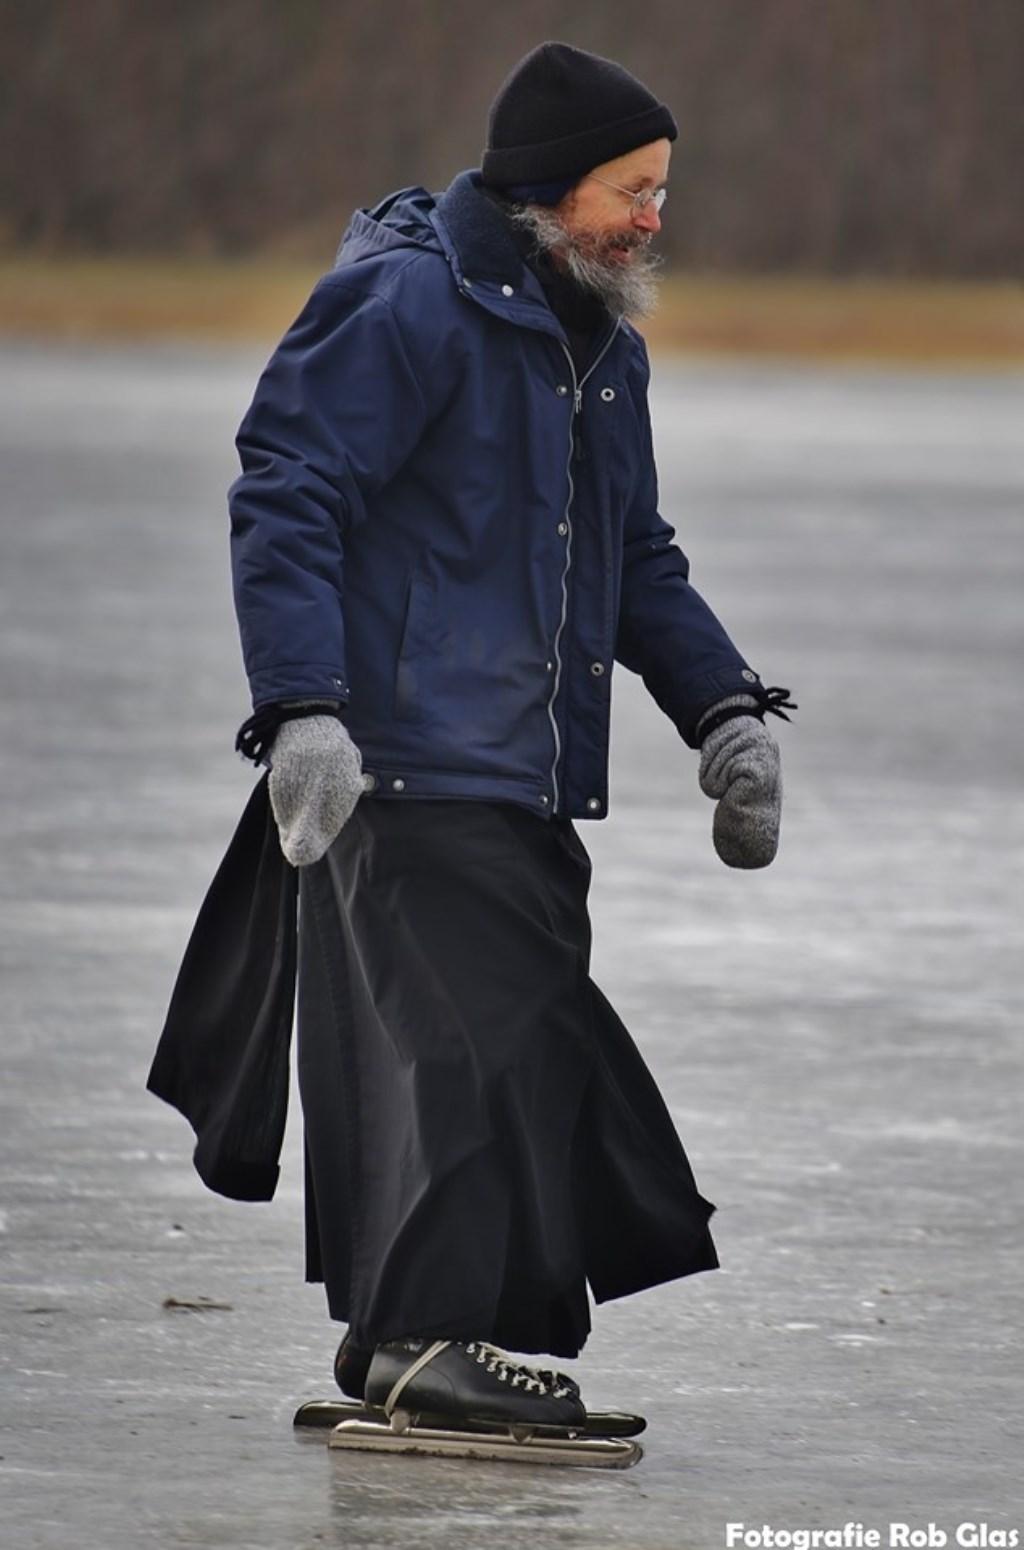 ''Mijn beste foto? Die maakte ik ooit van een schaatser die volledig in z'n element zat. Die had niks aan z'n hoofd en genoot volop. Dat is toch fantastisch?'' Foto: Rob Glas © rodi